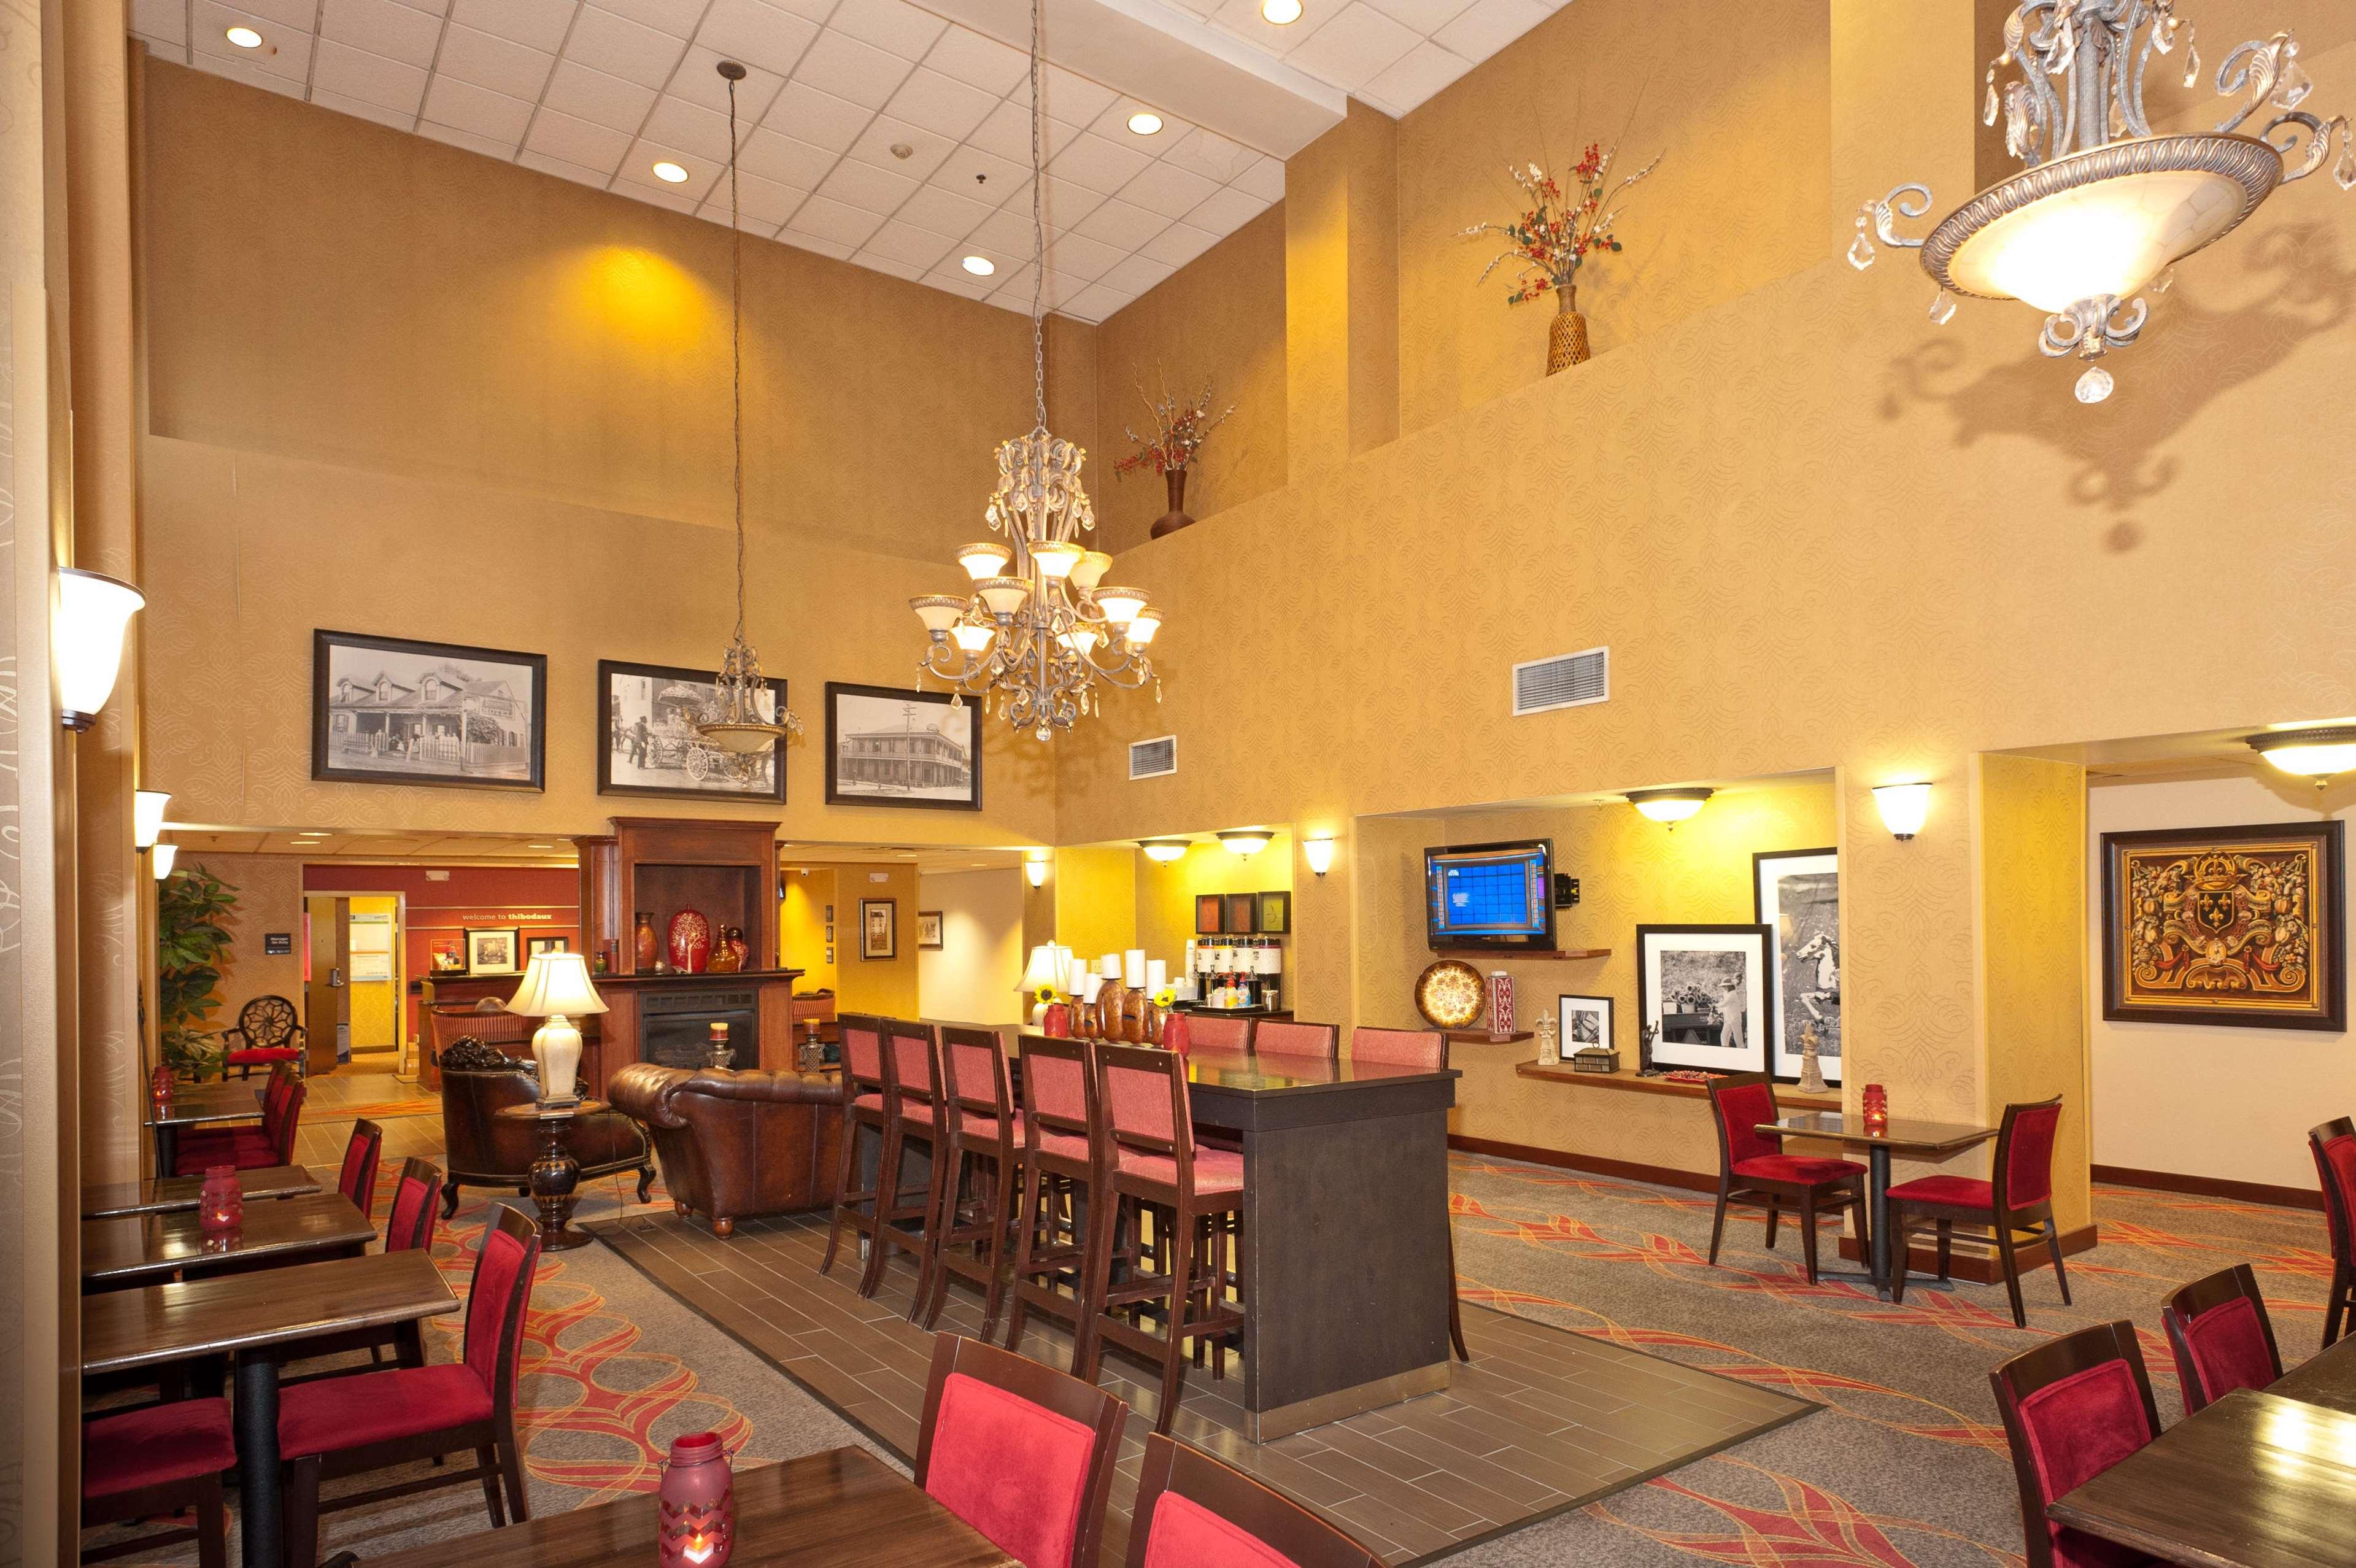 Hampton Inn & Suites Thibodaux image 1